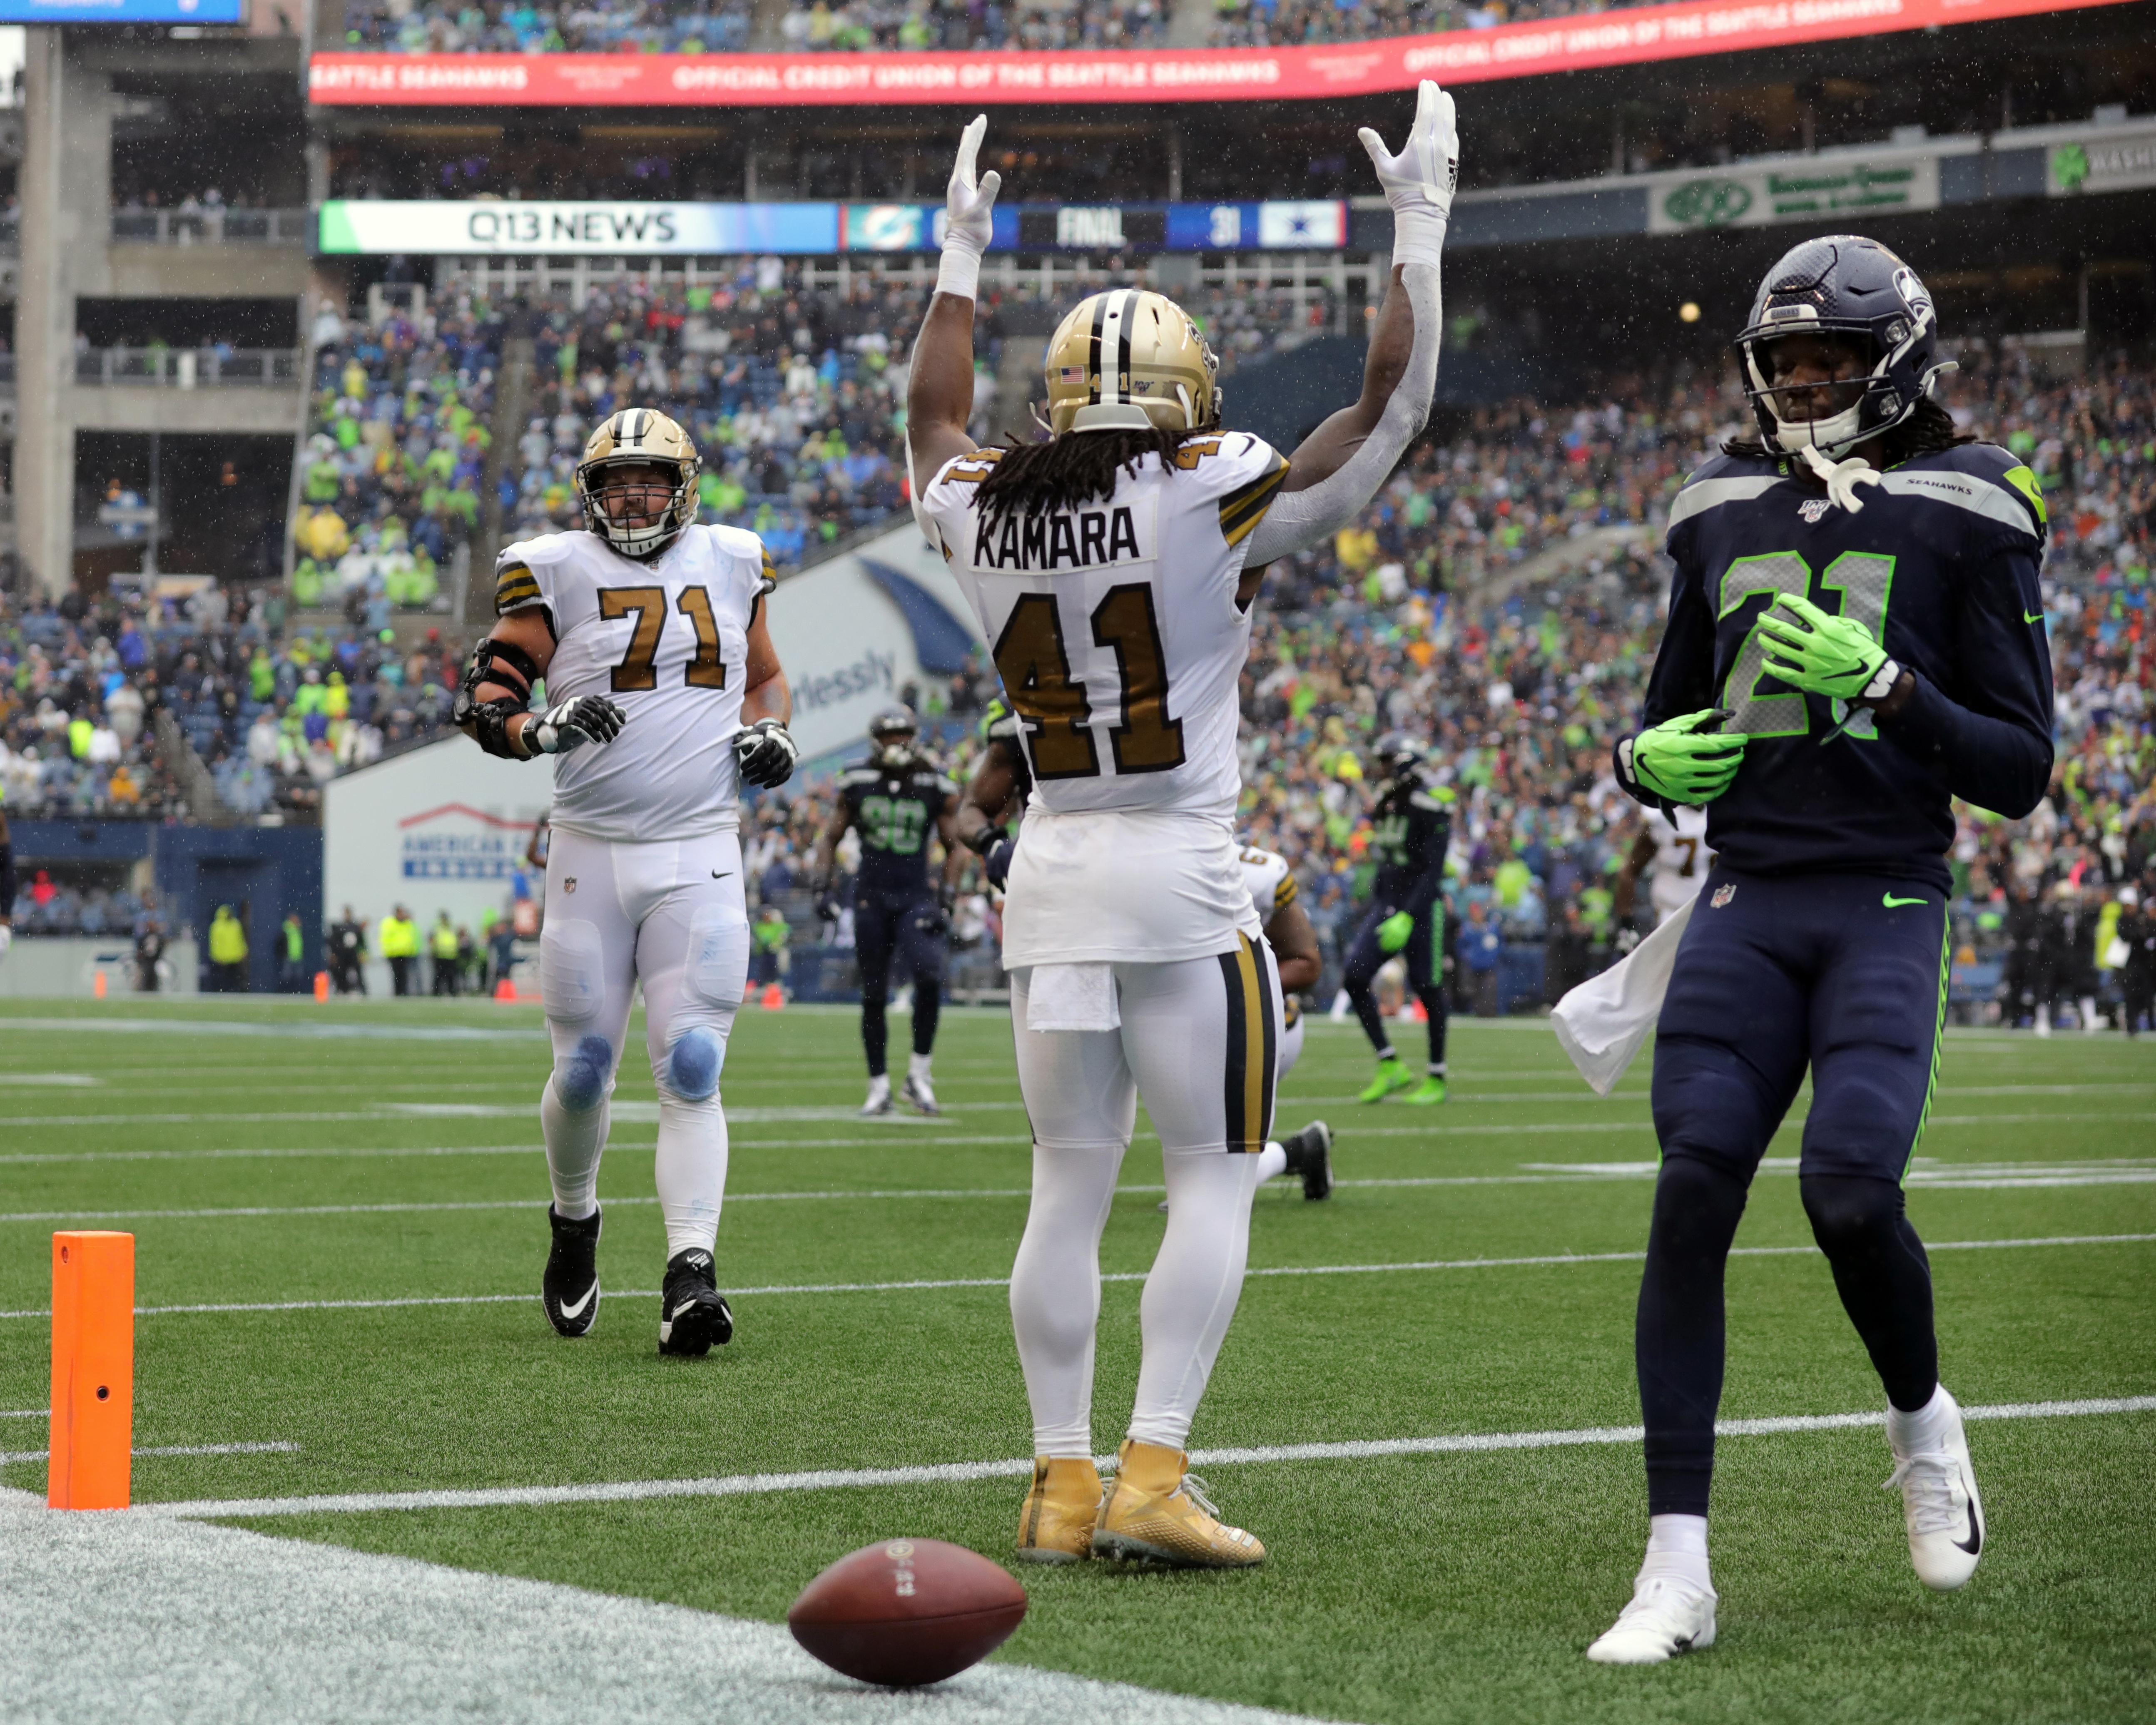 NFL: SEP 22 Saints at Seahawks